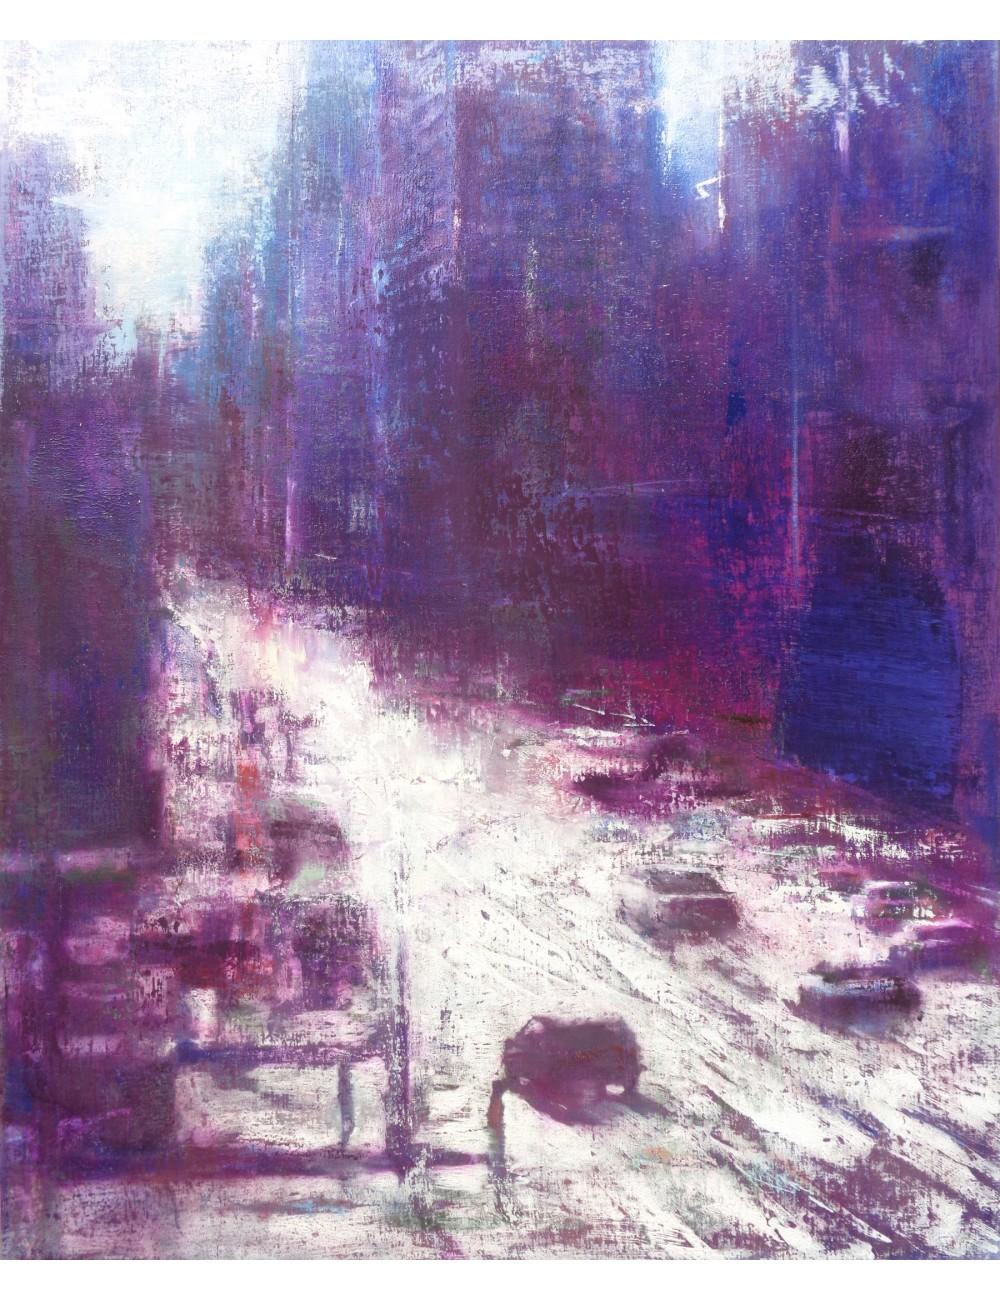 Neige III, 2018 peinture de Régis Rizzo